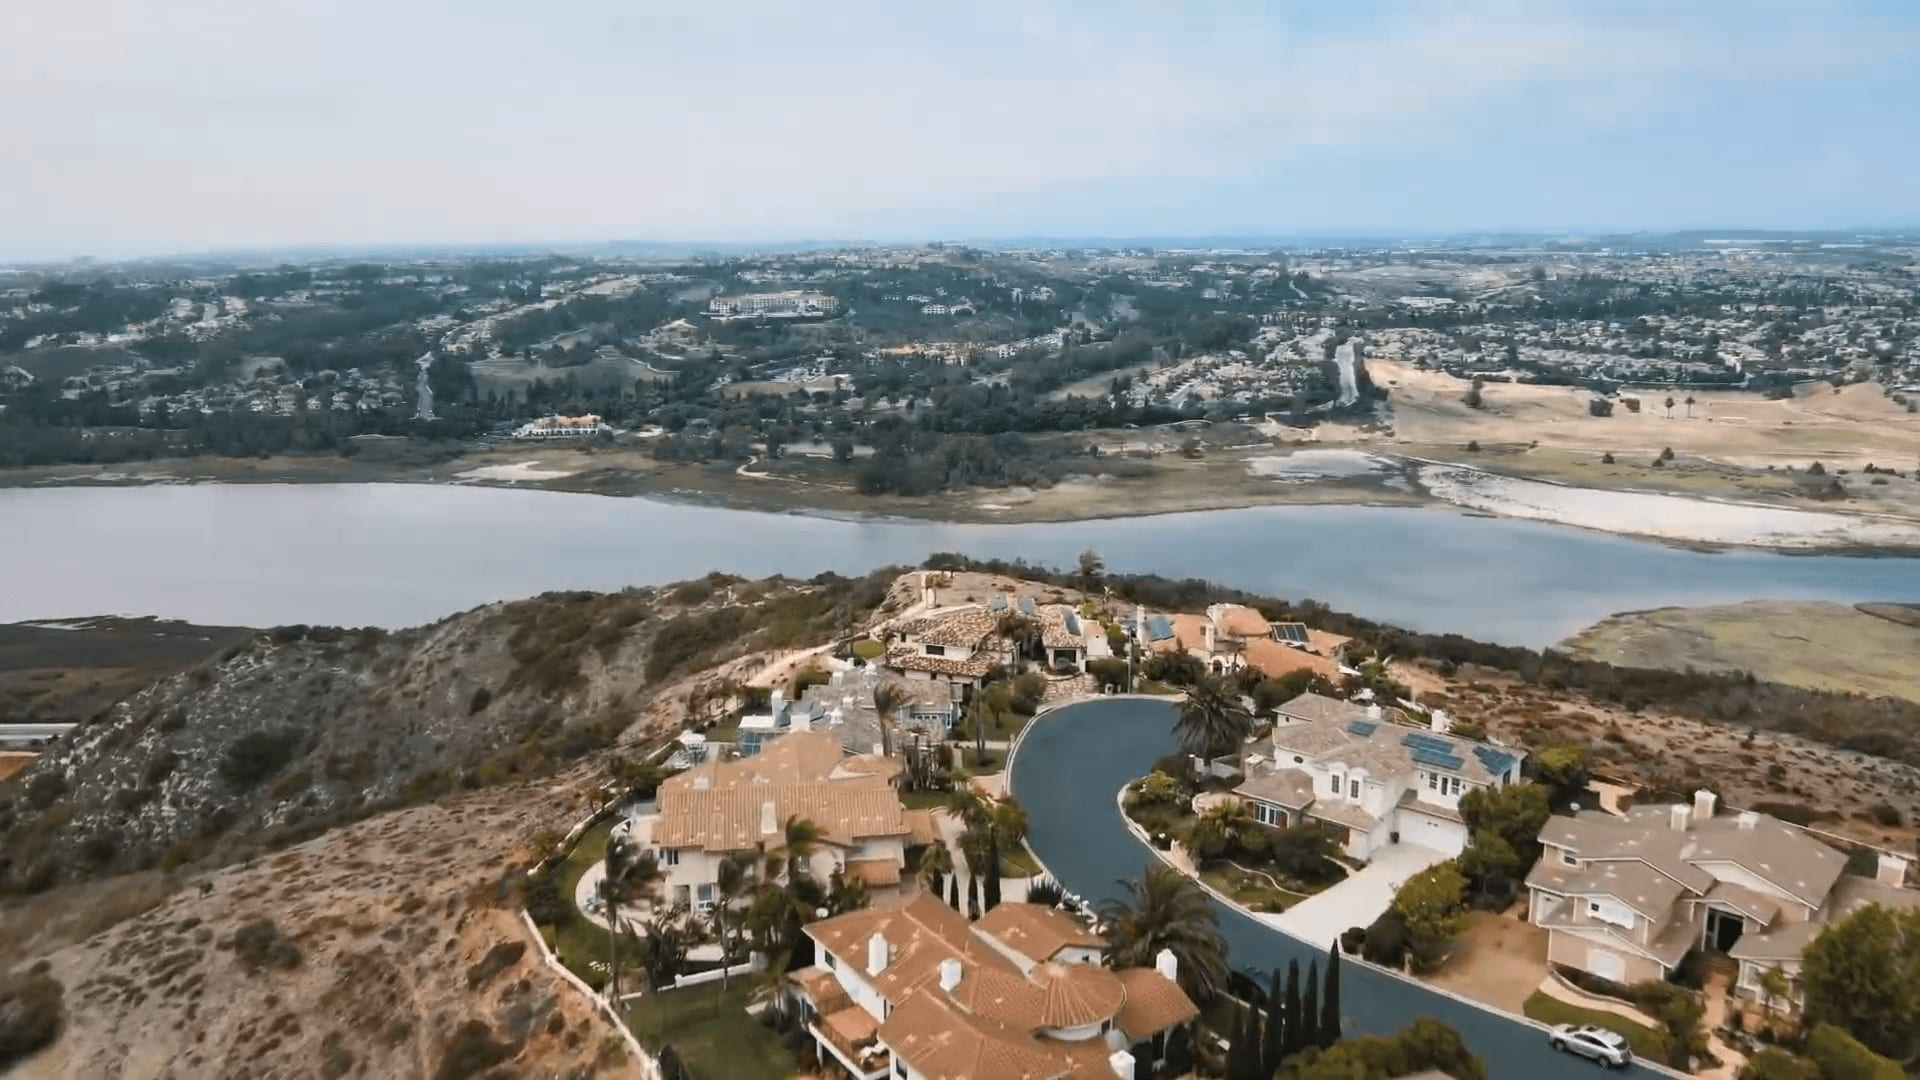 1710 BELLA LAGUNA COURT, ENCINITAS, CALIFORNIA 92024 video preview